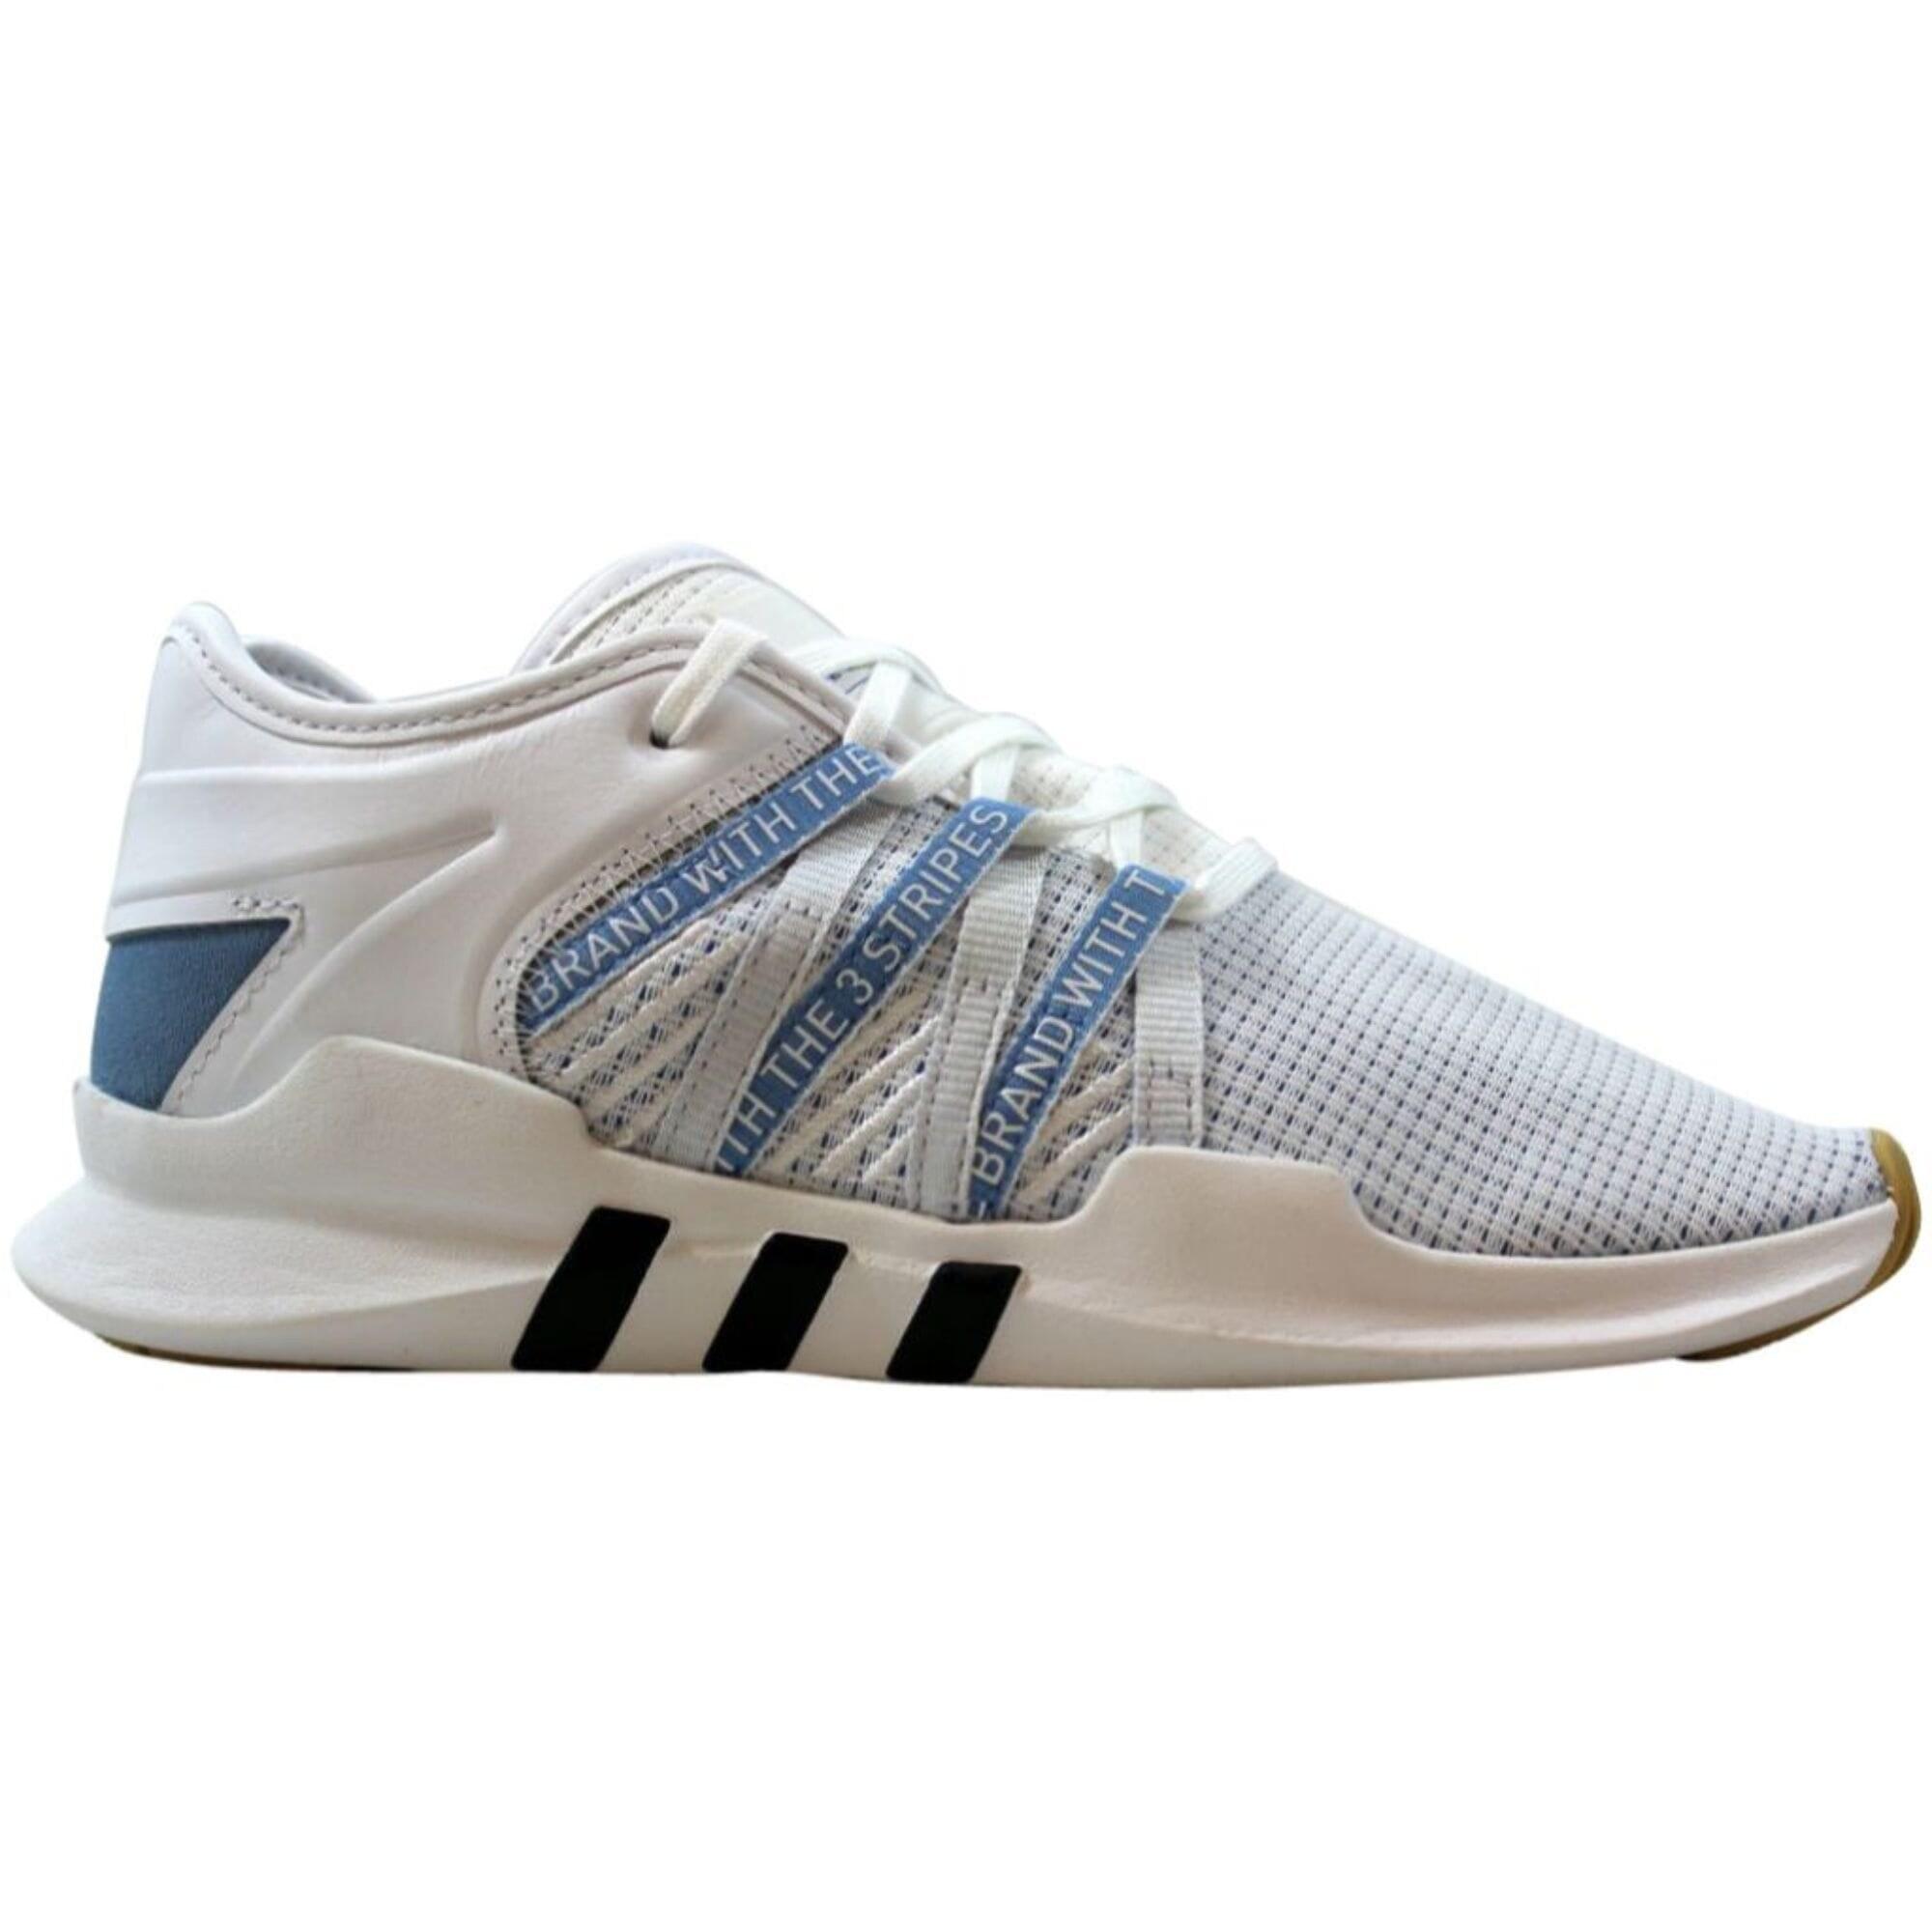 Adidas Eqt Racing Adv Footwear White/Ash Blue-Core Black CQ2155 Women's